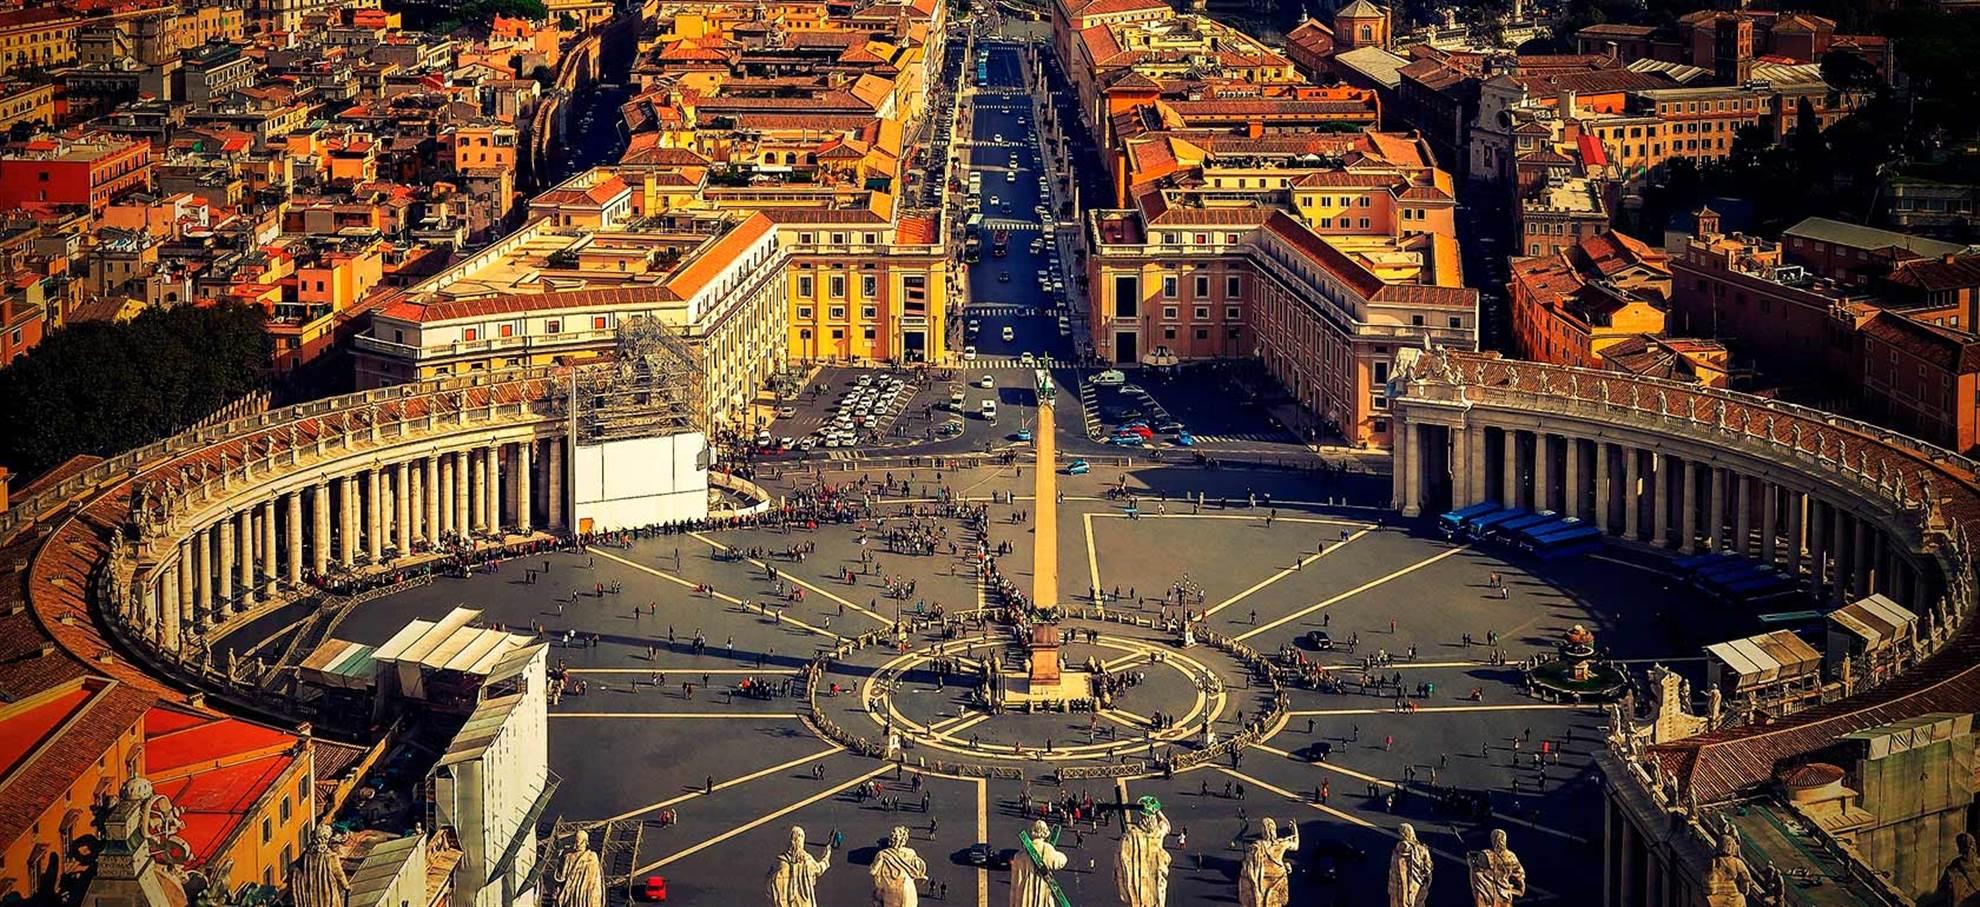 Vaticaanse Musea & Sixtijnse Kapel Skip the line!